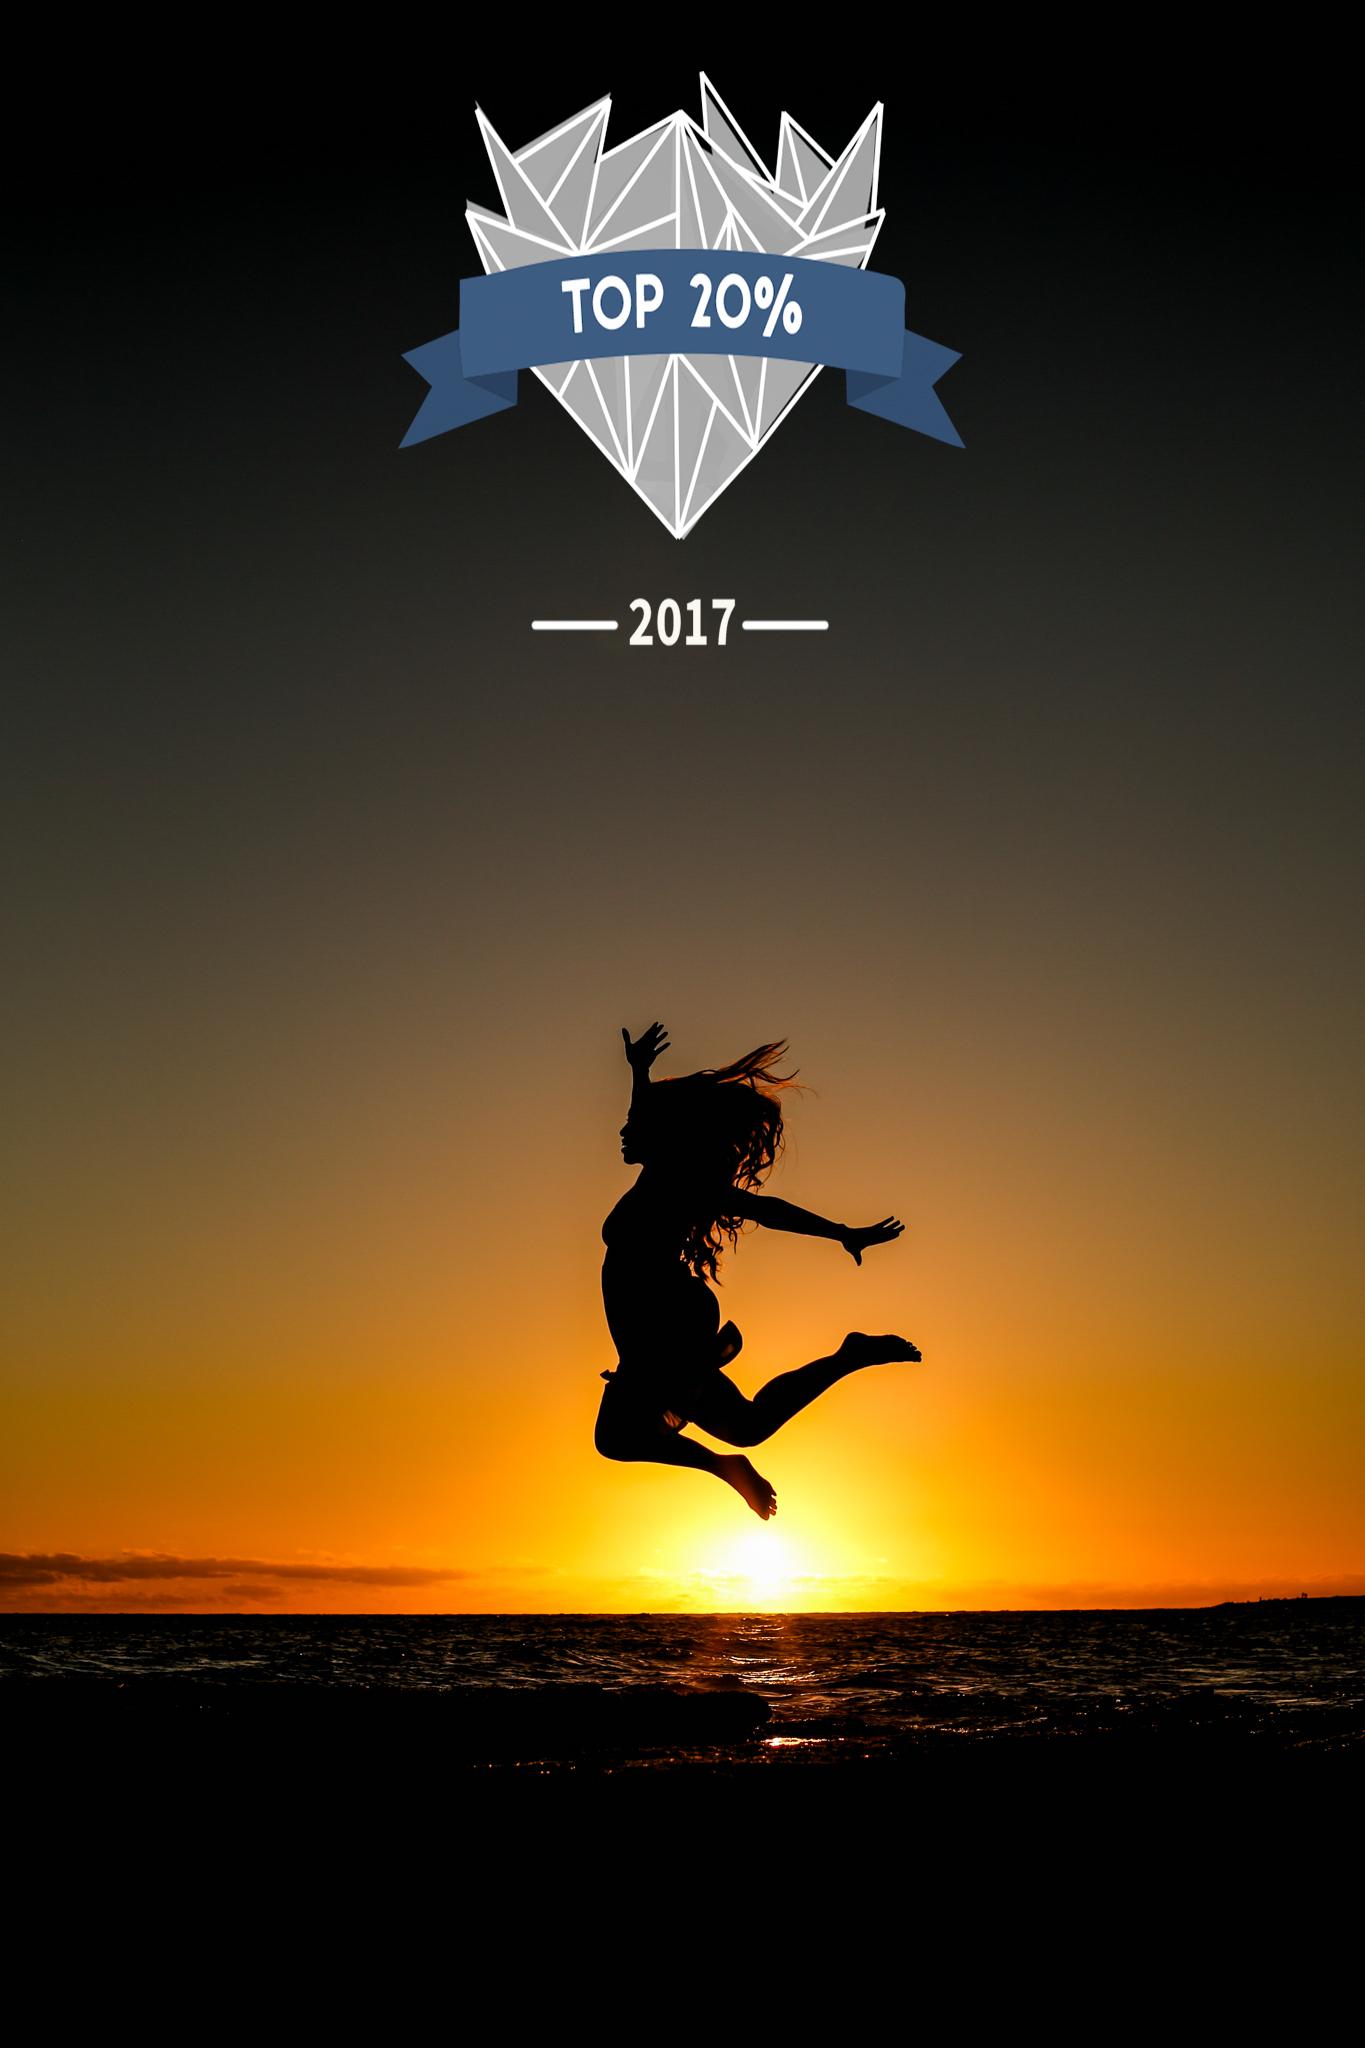 non watermarked 2017 shoot and share photo awards aloha sunshine photography 3January 08, 2017.jpg